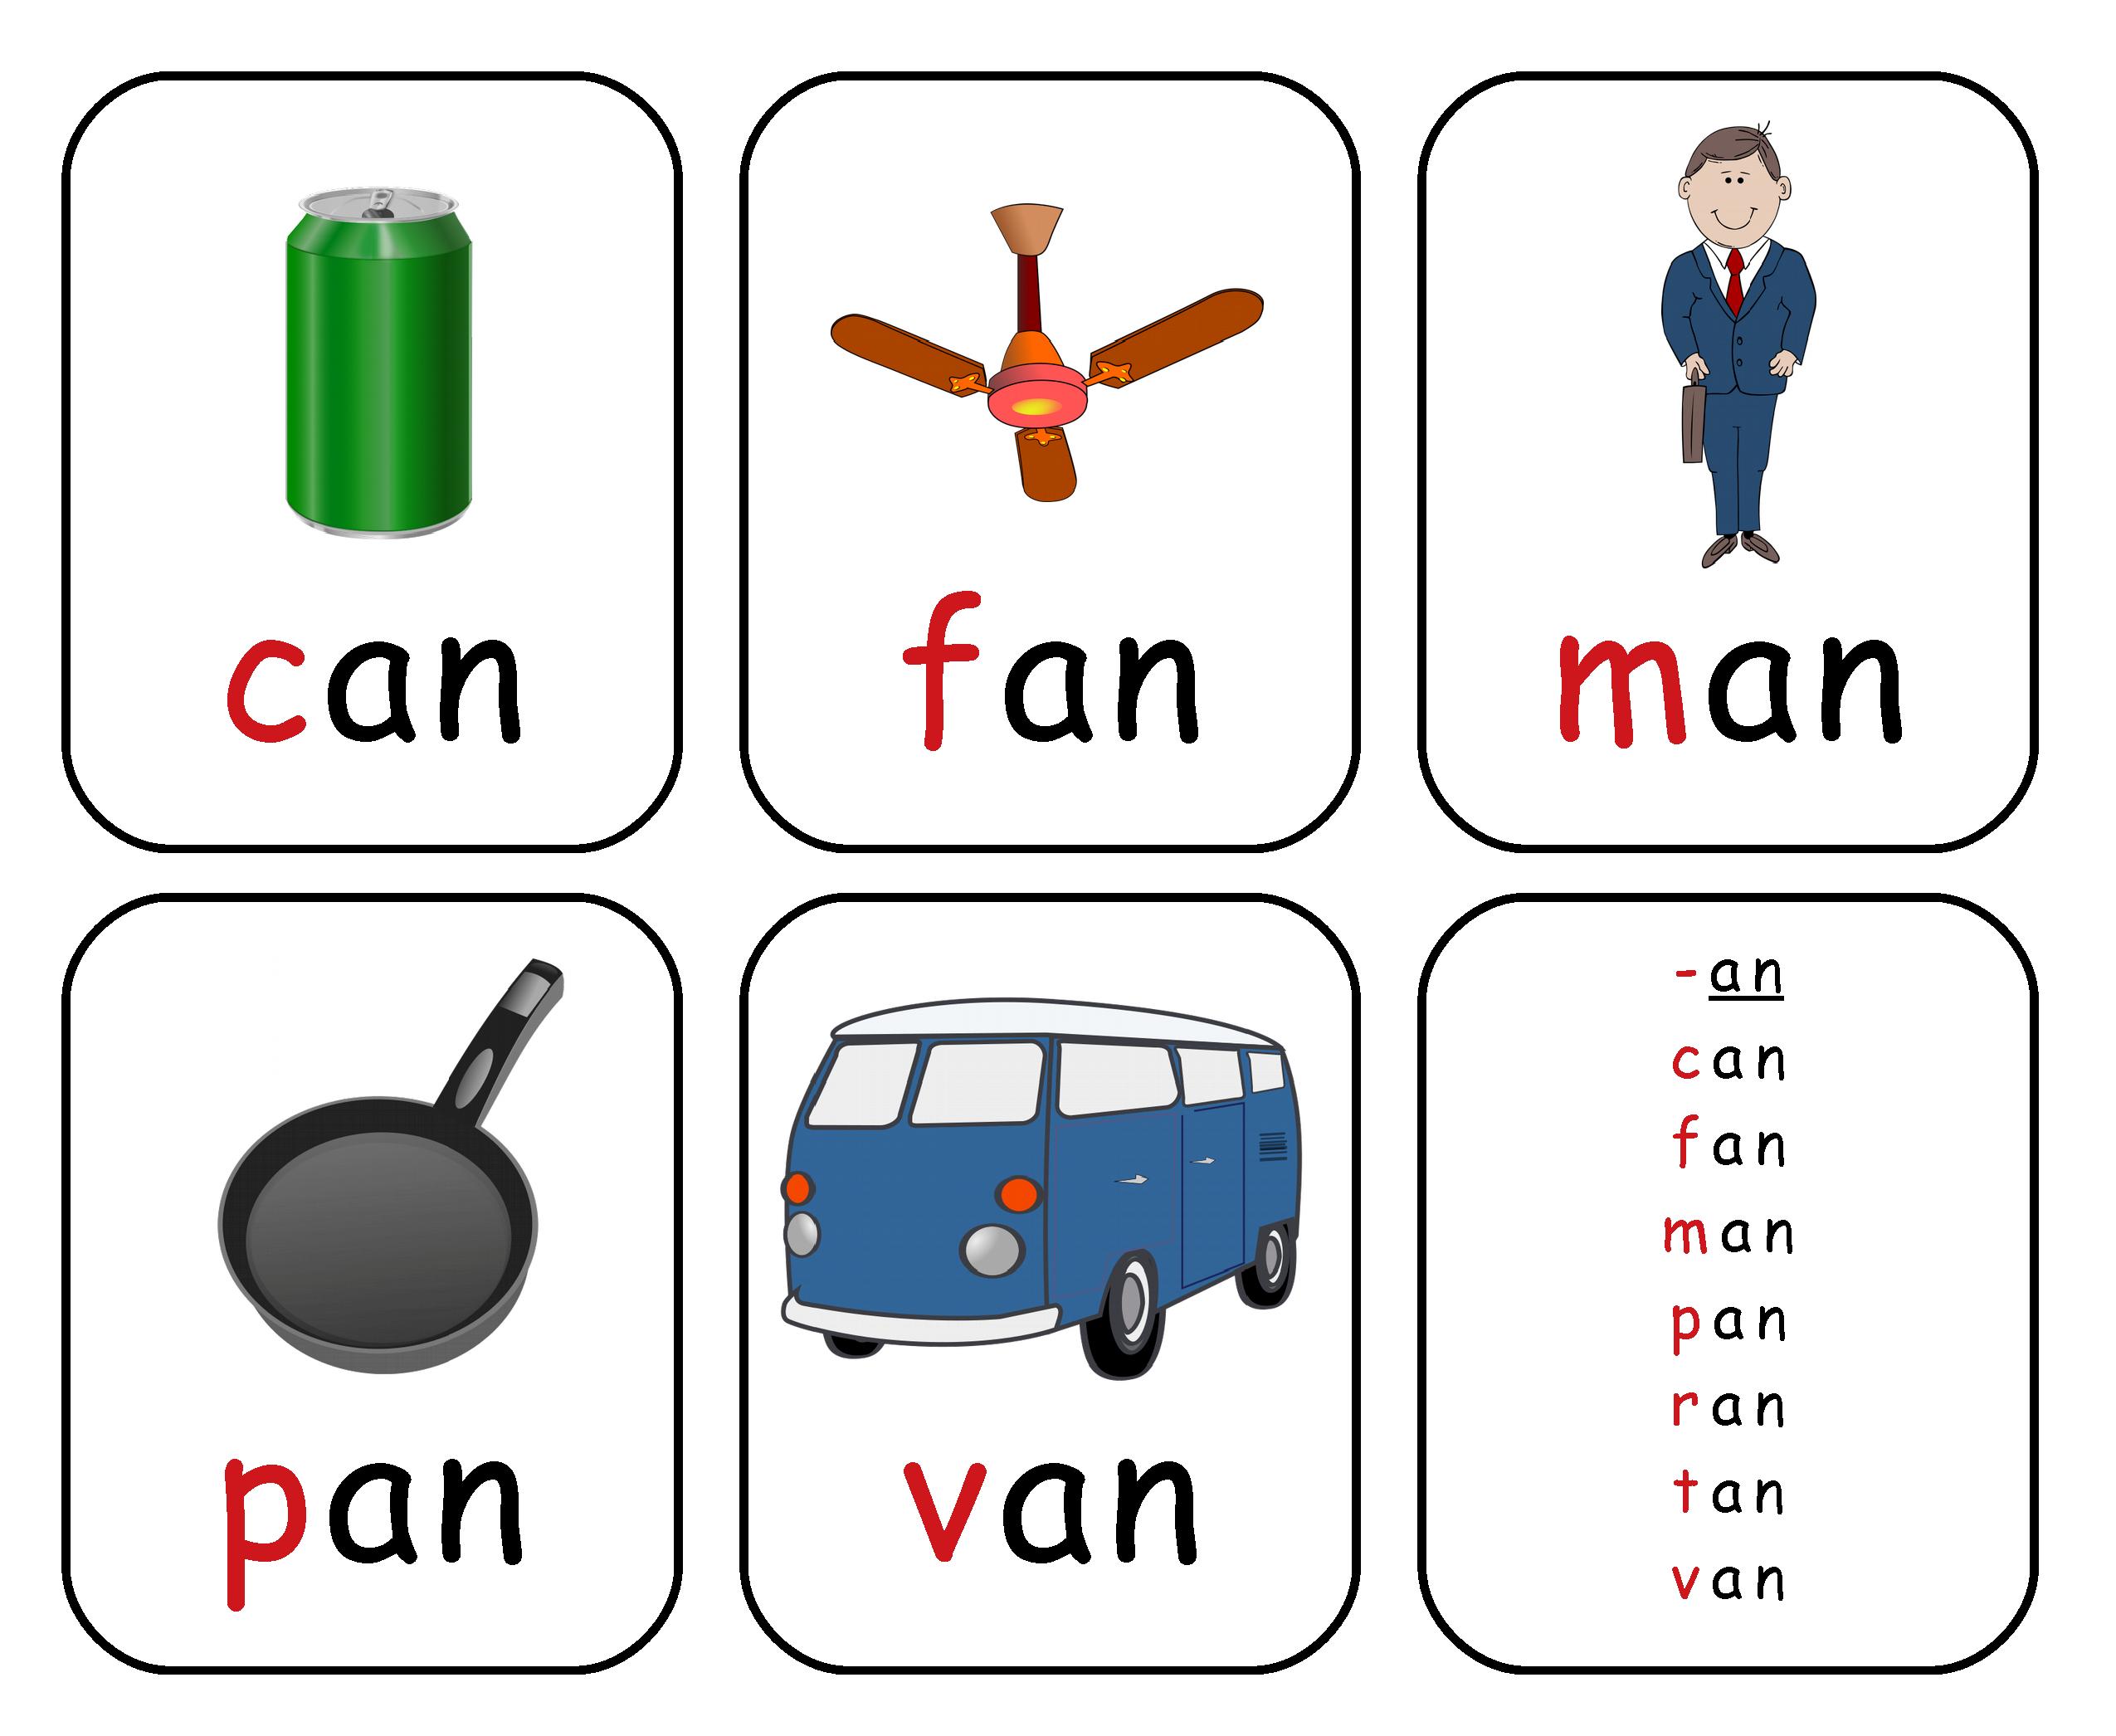 Home Learning Rhyming Pocket Flash Cards Helps Teach Children Rhyming Words